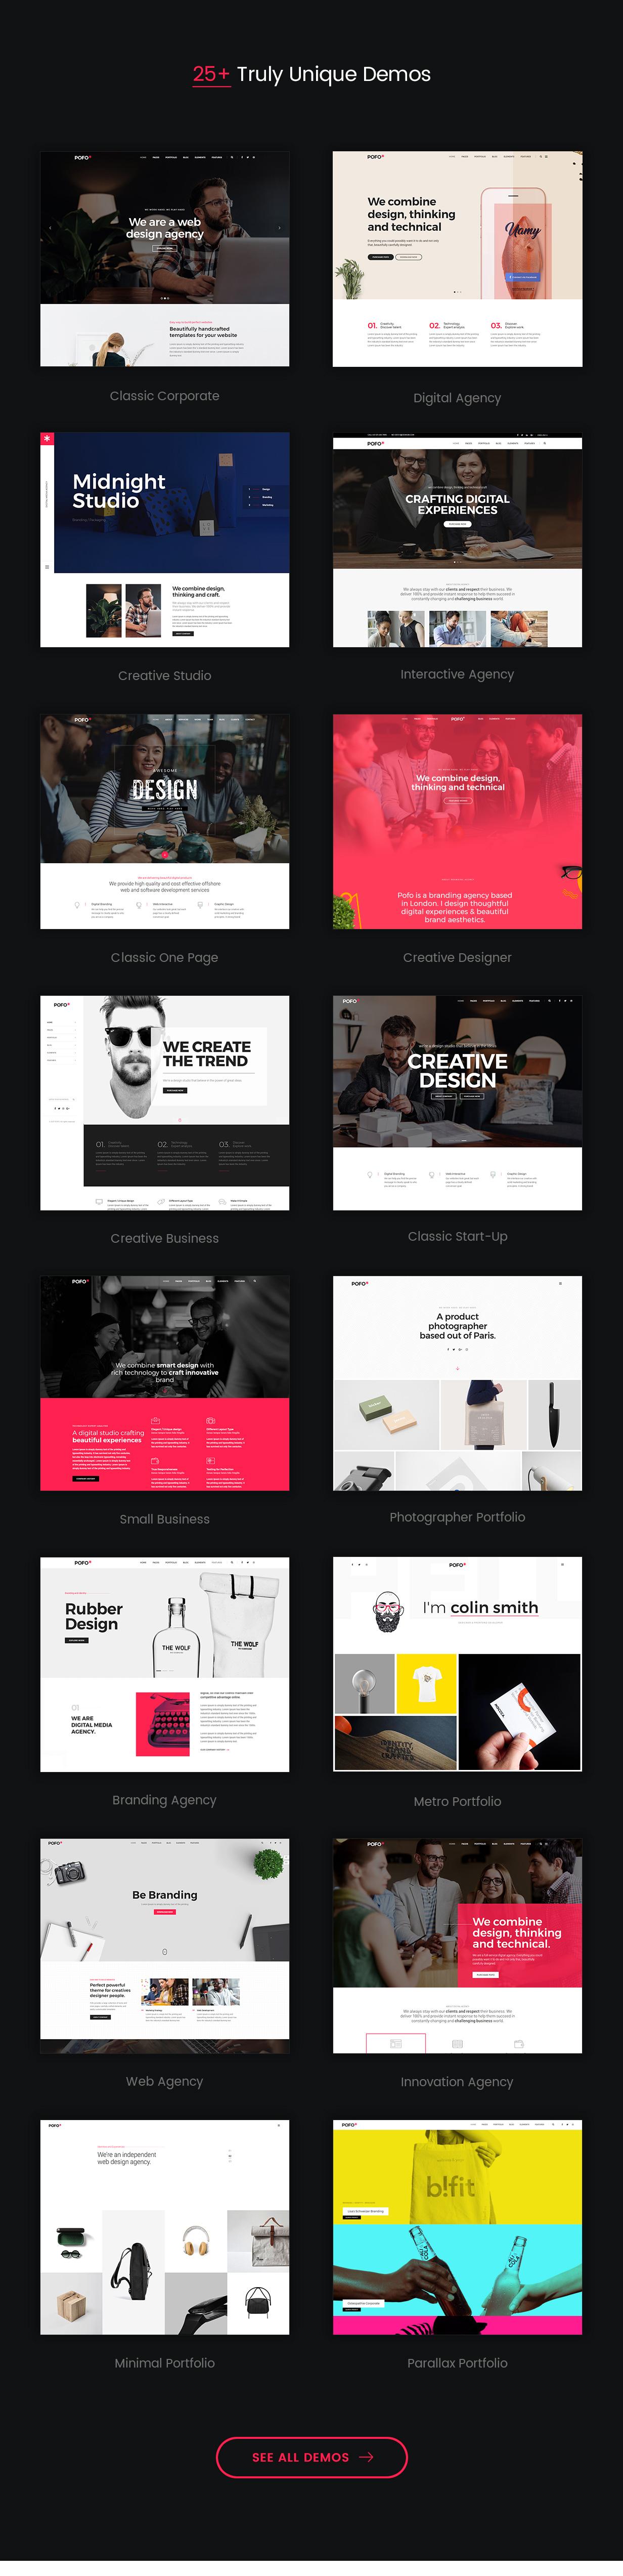 Pofo - Creative Portfolio and Blog WordPress Theme - 8